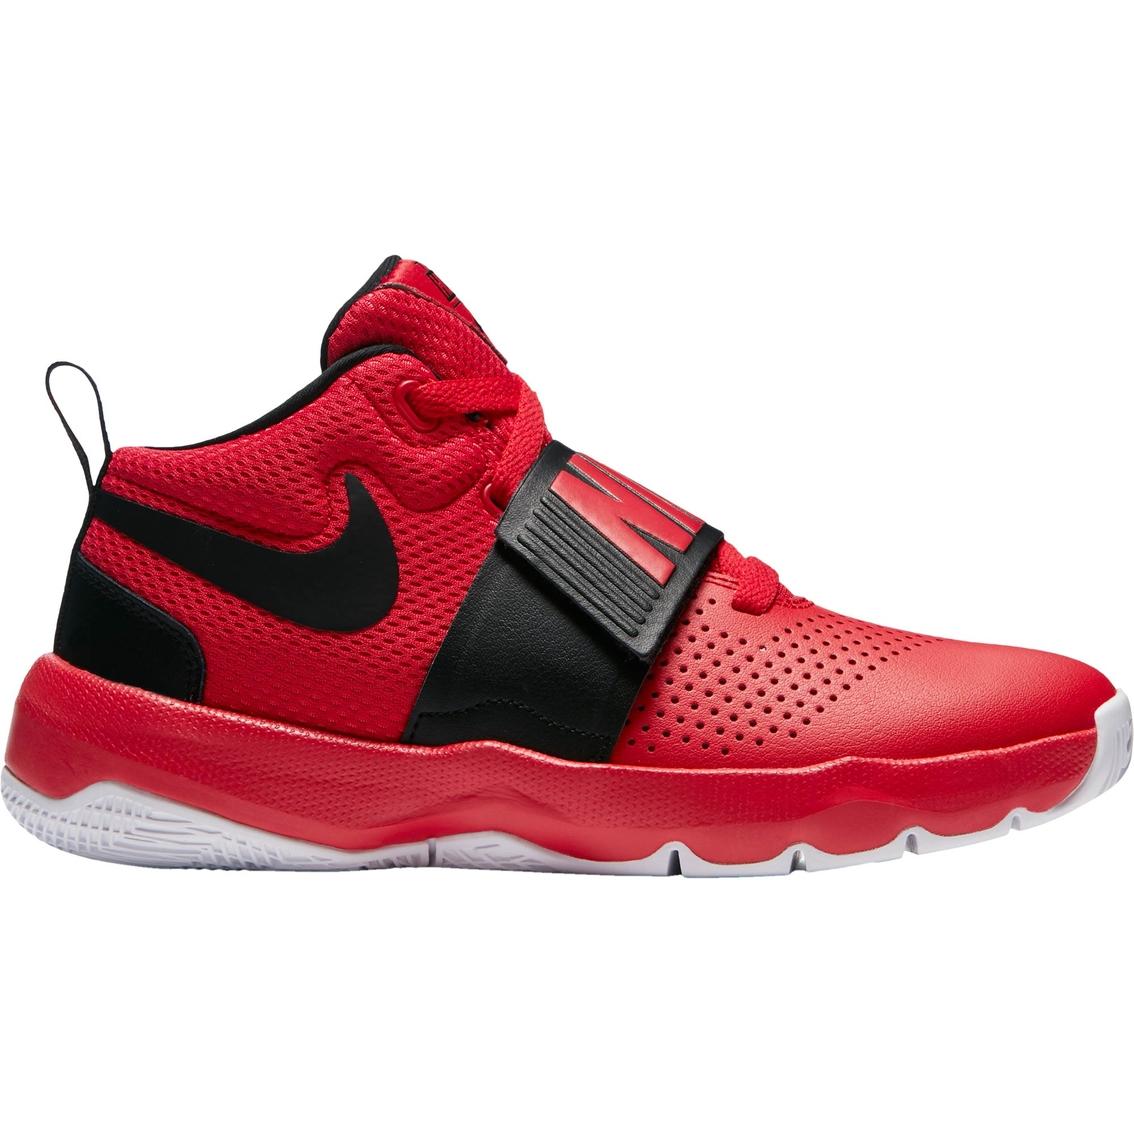 half off 3d6e7 b8cb3 Nike Grade School Boys Team Hustle D8 Basketball Shoes